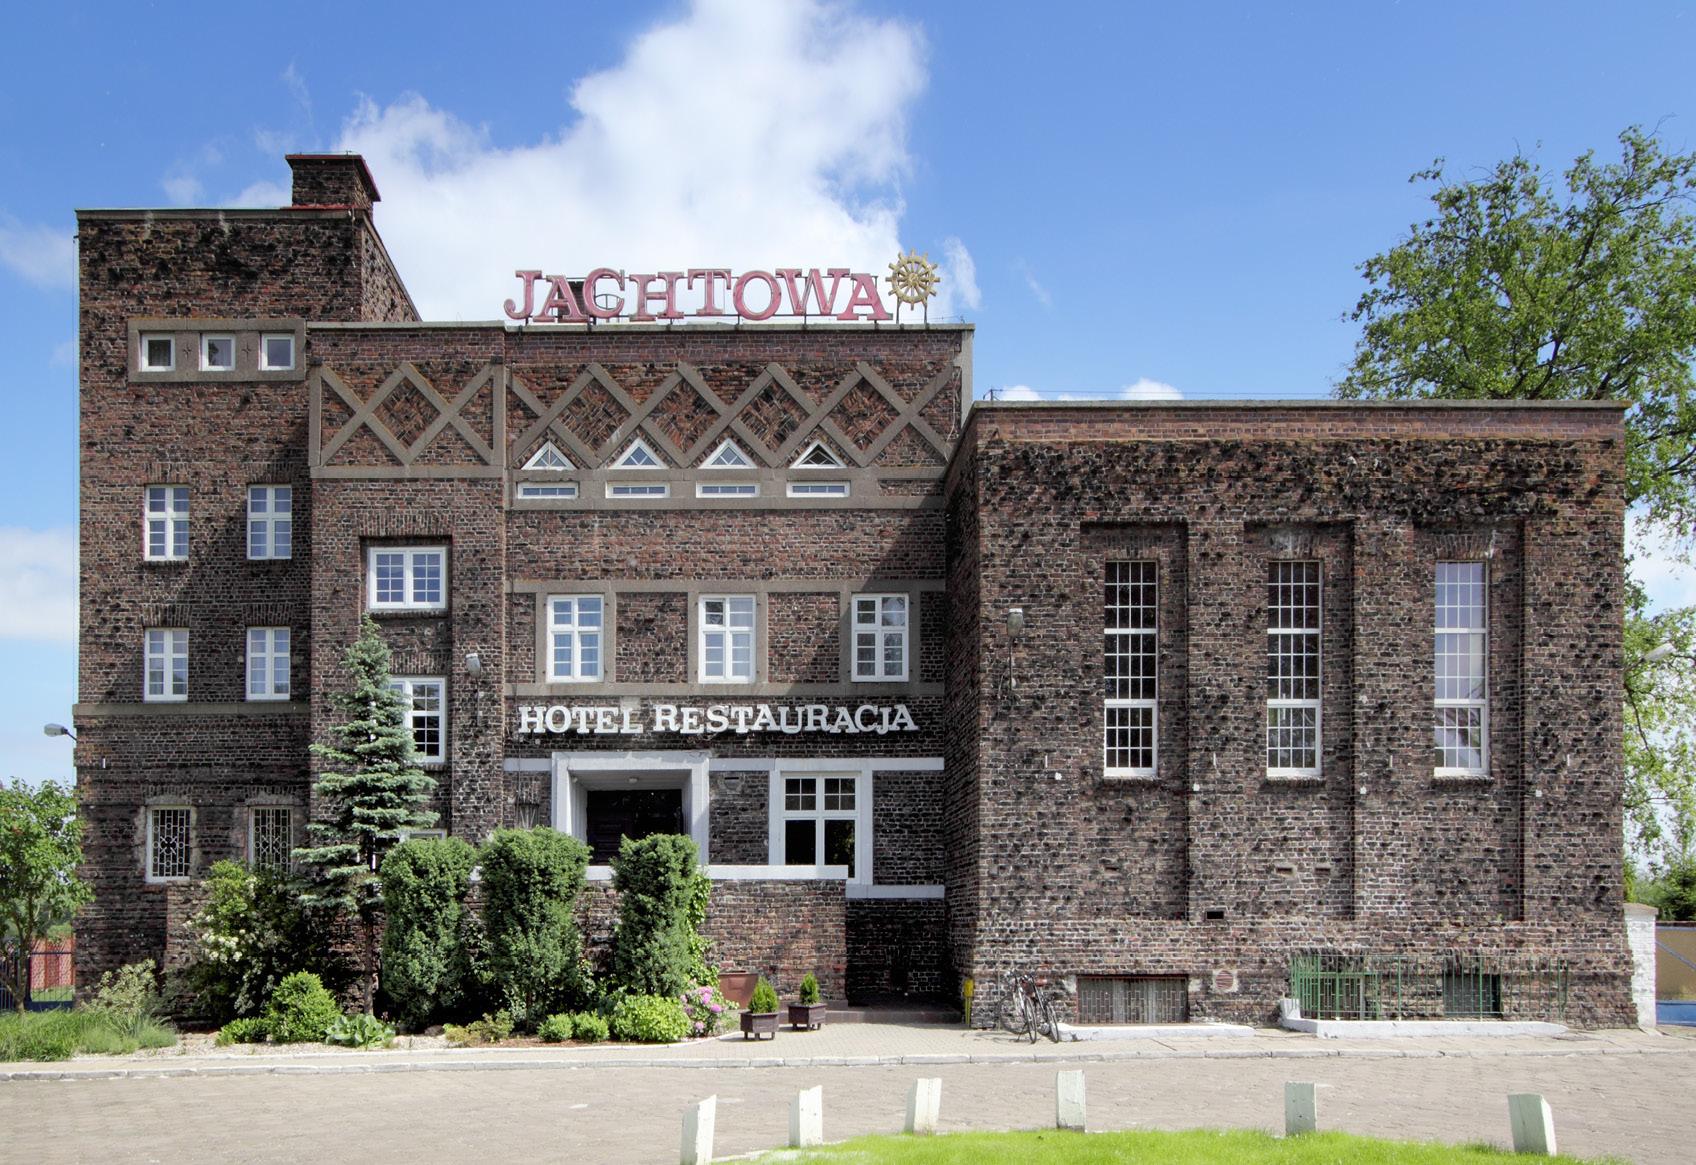 Polen_ Szczecin-Stettin_Vereinshaus Stettiner Jachtclub_Gustav Gauss_1924